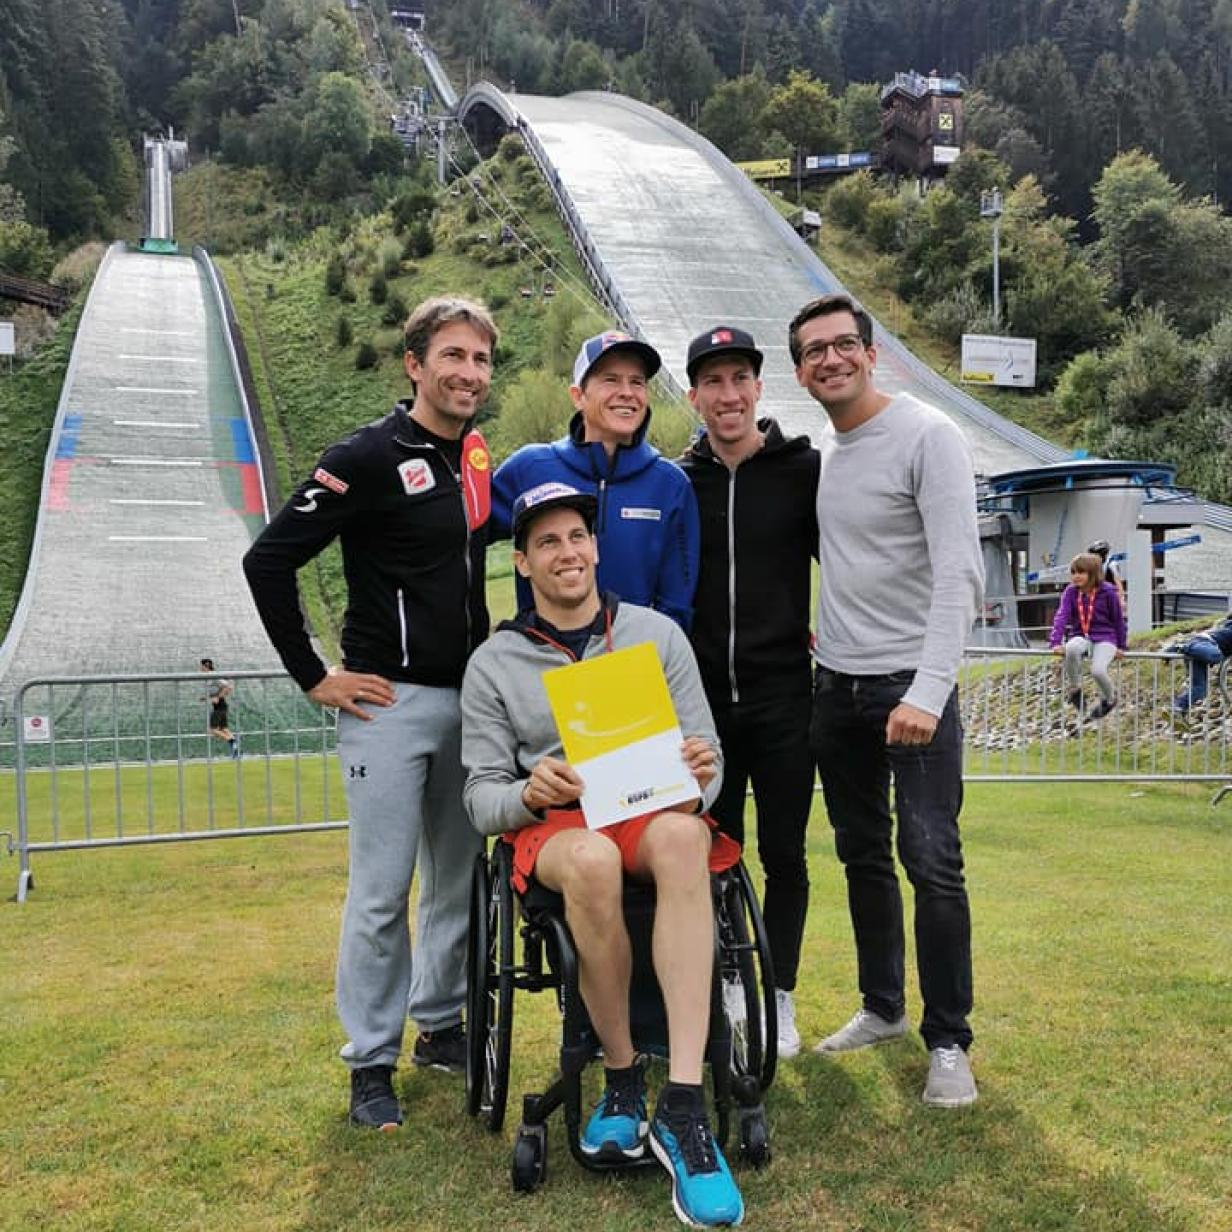 Skisprung-Coach im Rollstuhl: Lukas Müller hat das erste Diplom